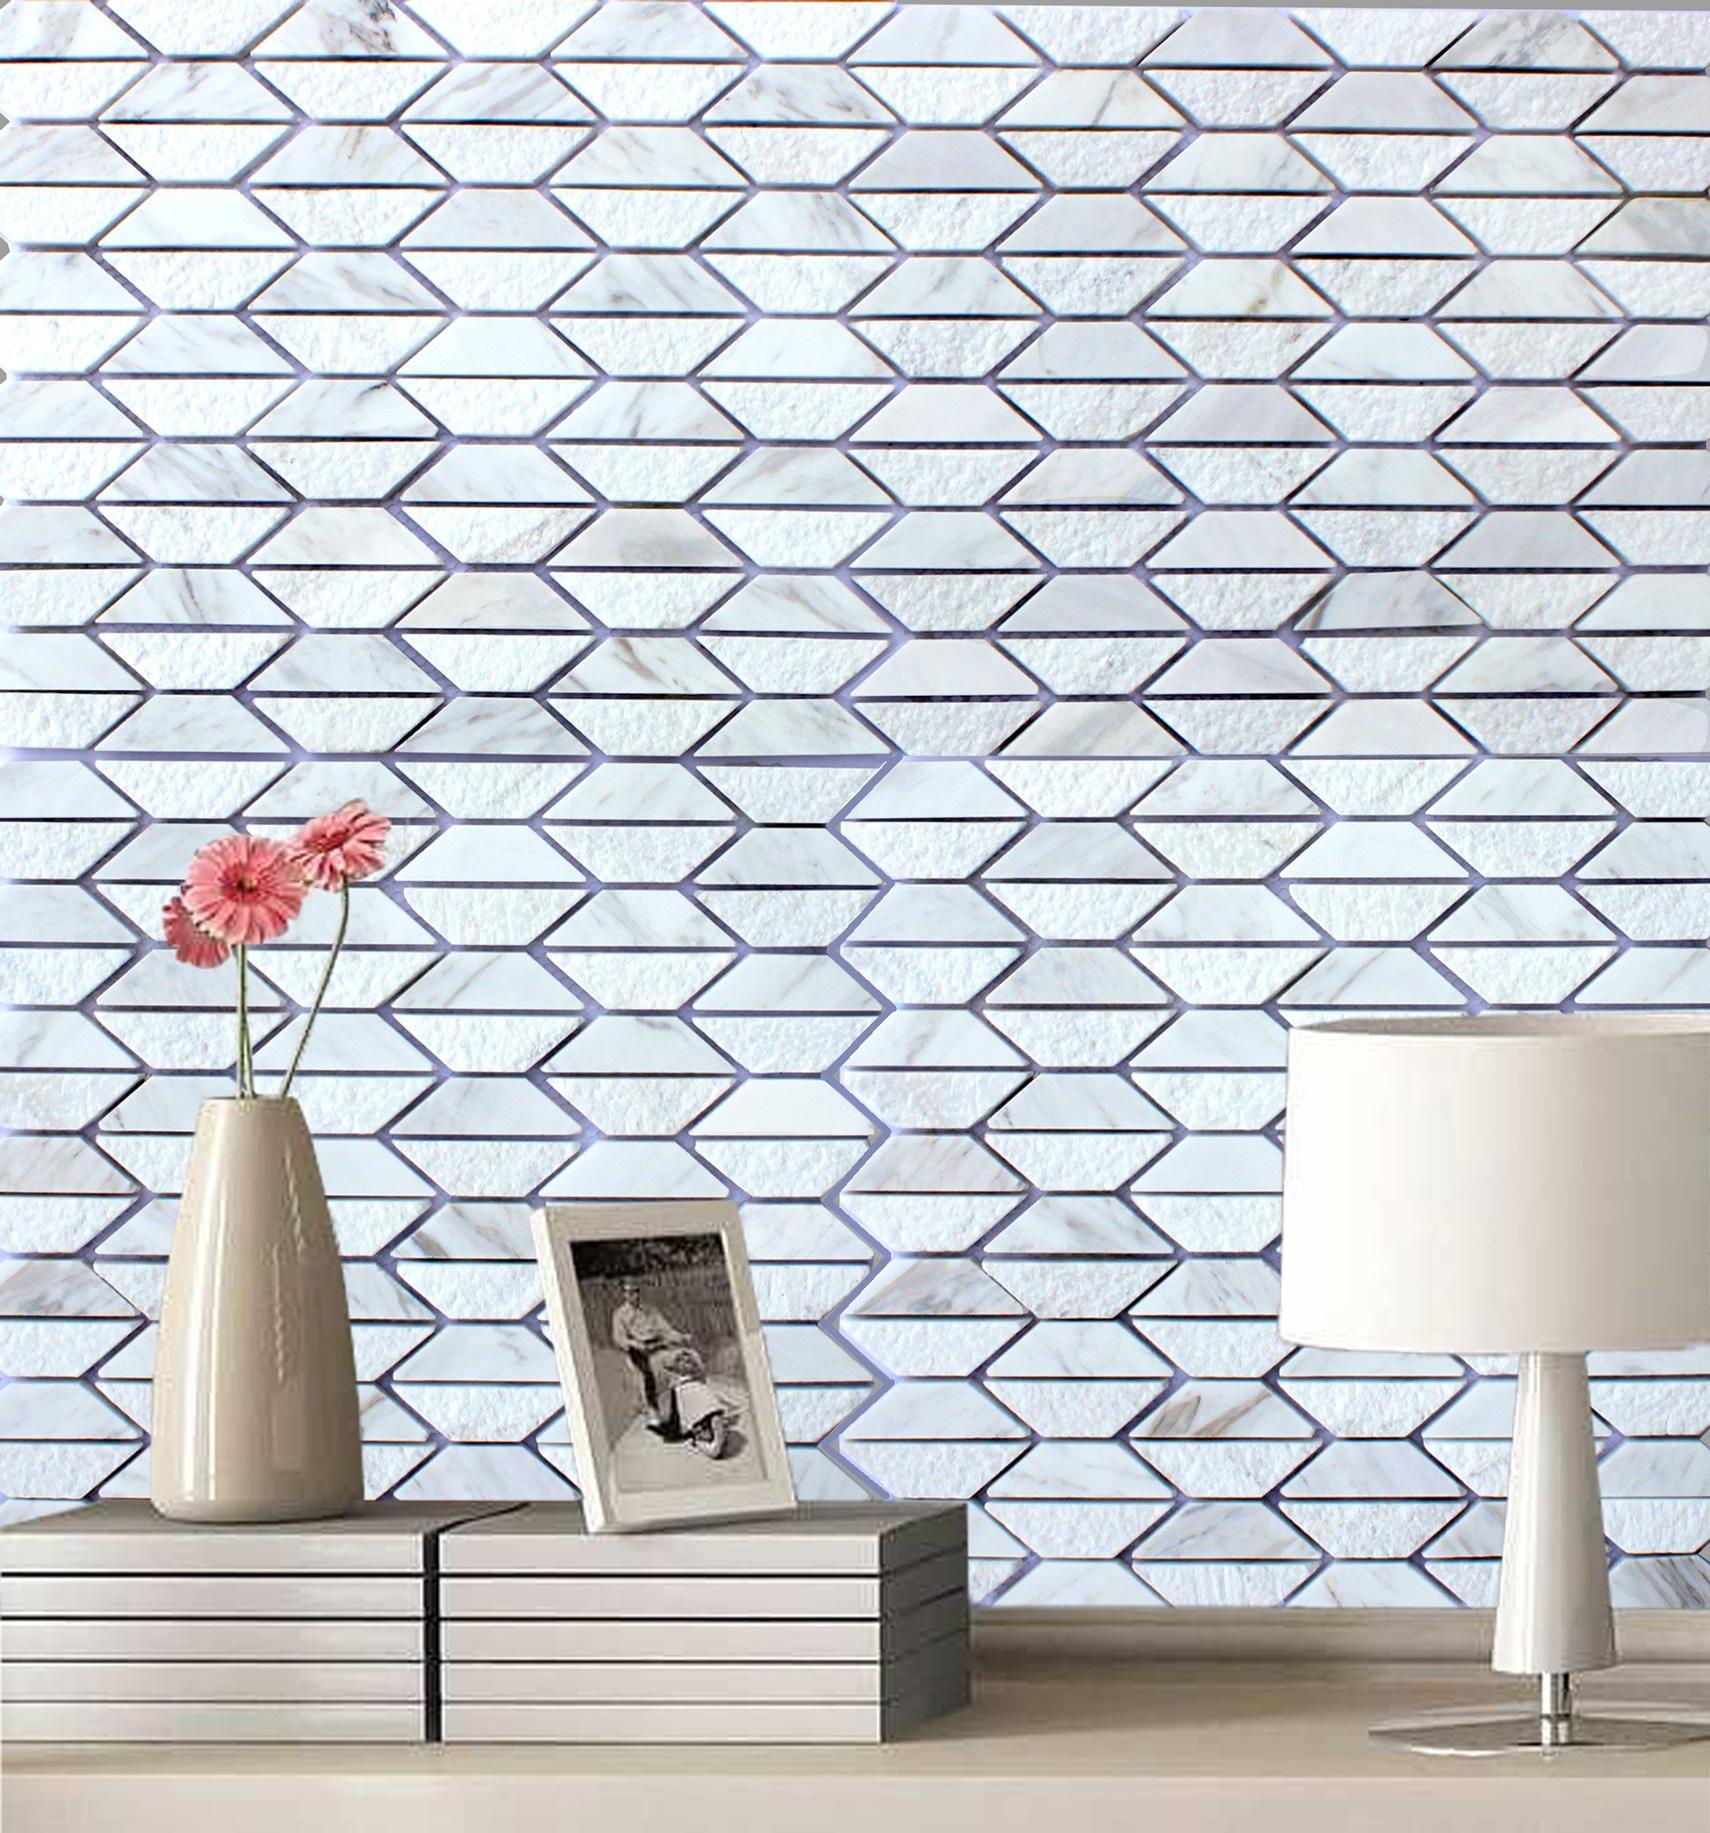 Fergus Lime Stone Marble Mosaic Tile -684 | Decor Papa: Mosaic Tiles ...